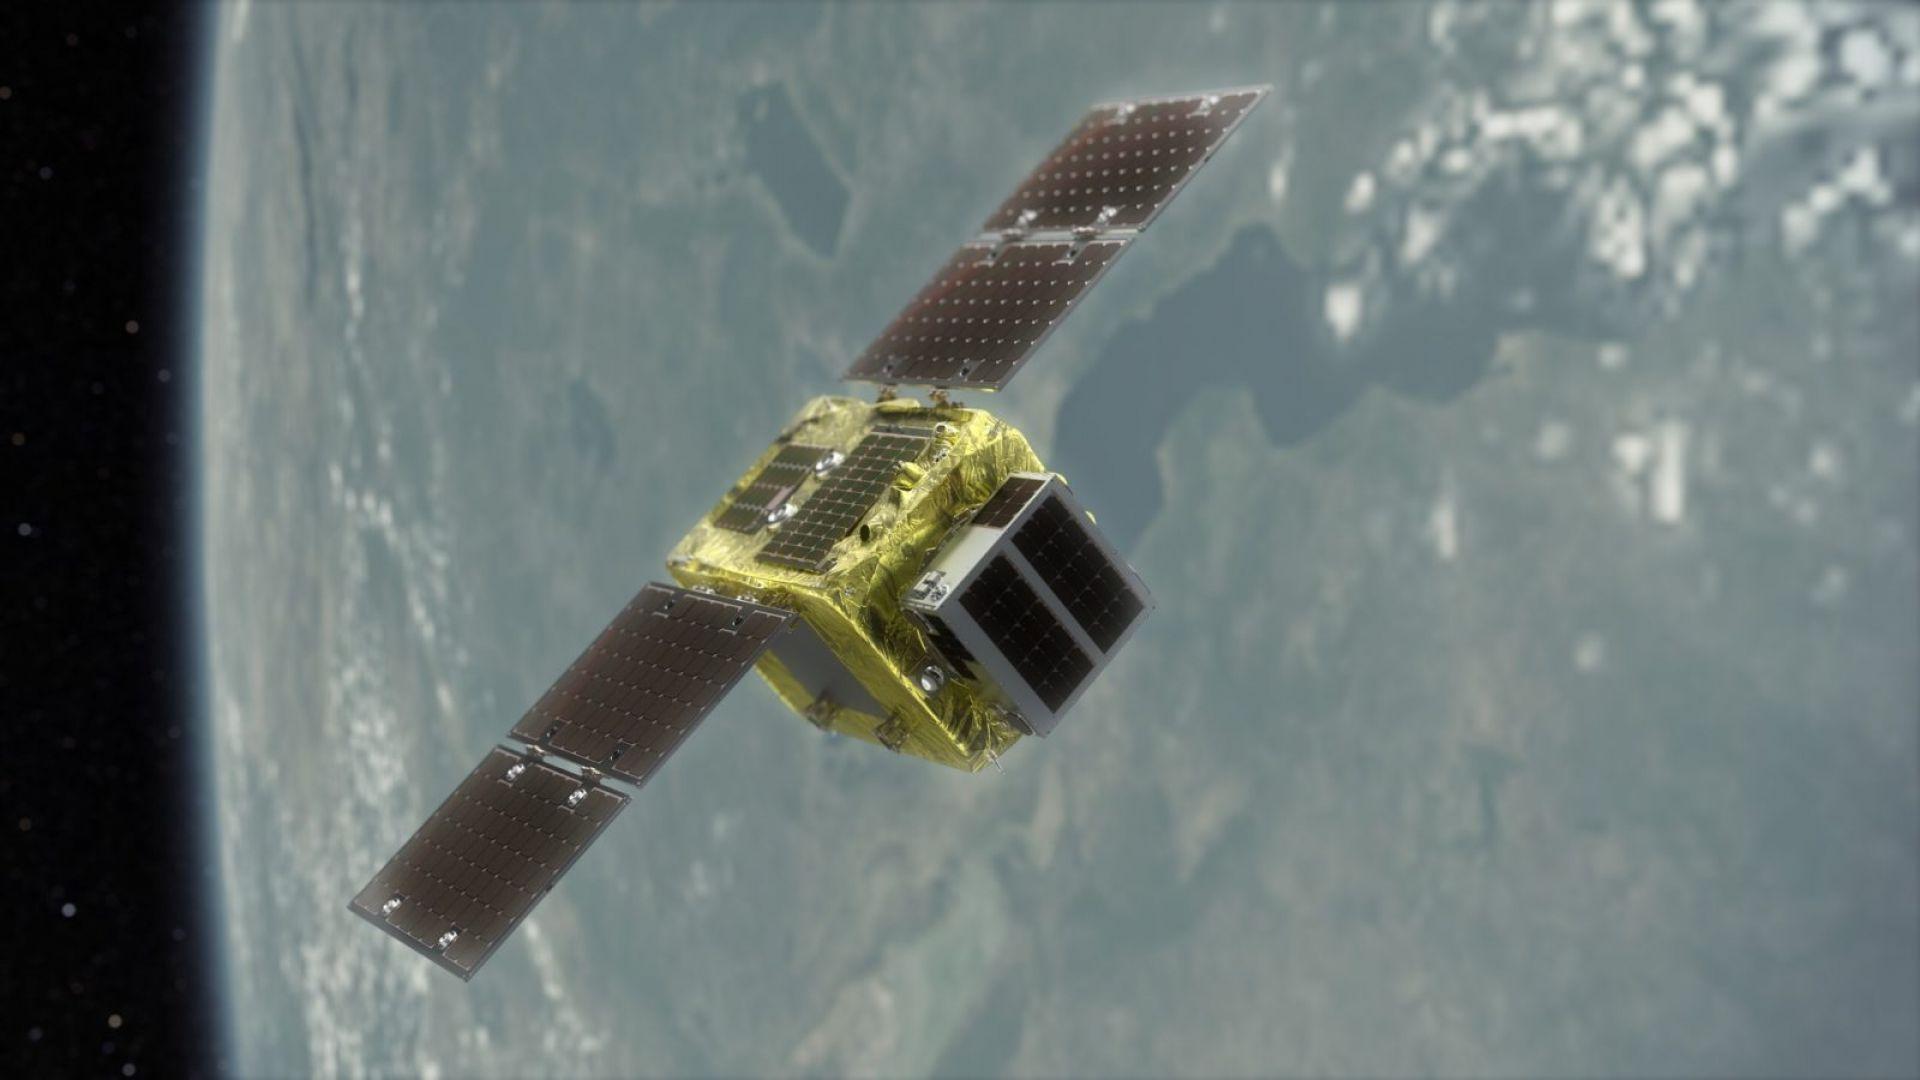 Нов вид сателит ще унищожава космическия боклук